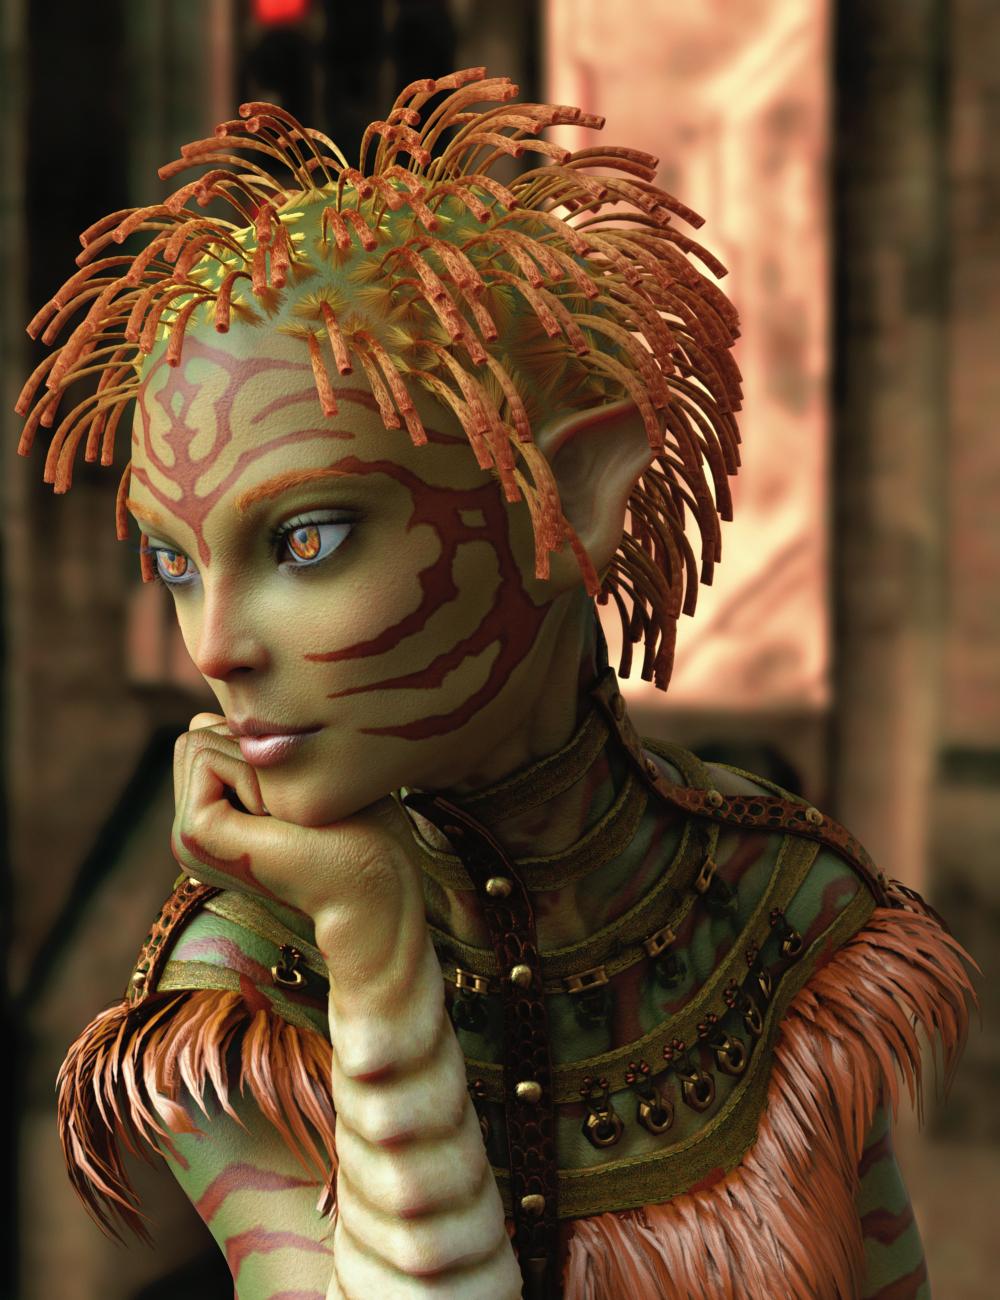 Alien Styles Hair for Genesis 8 Females by: 3Diva, 3D Models by Daz 3D